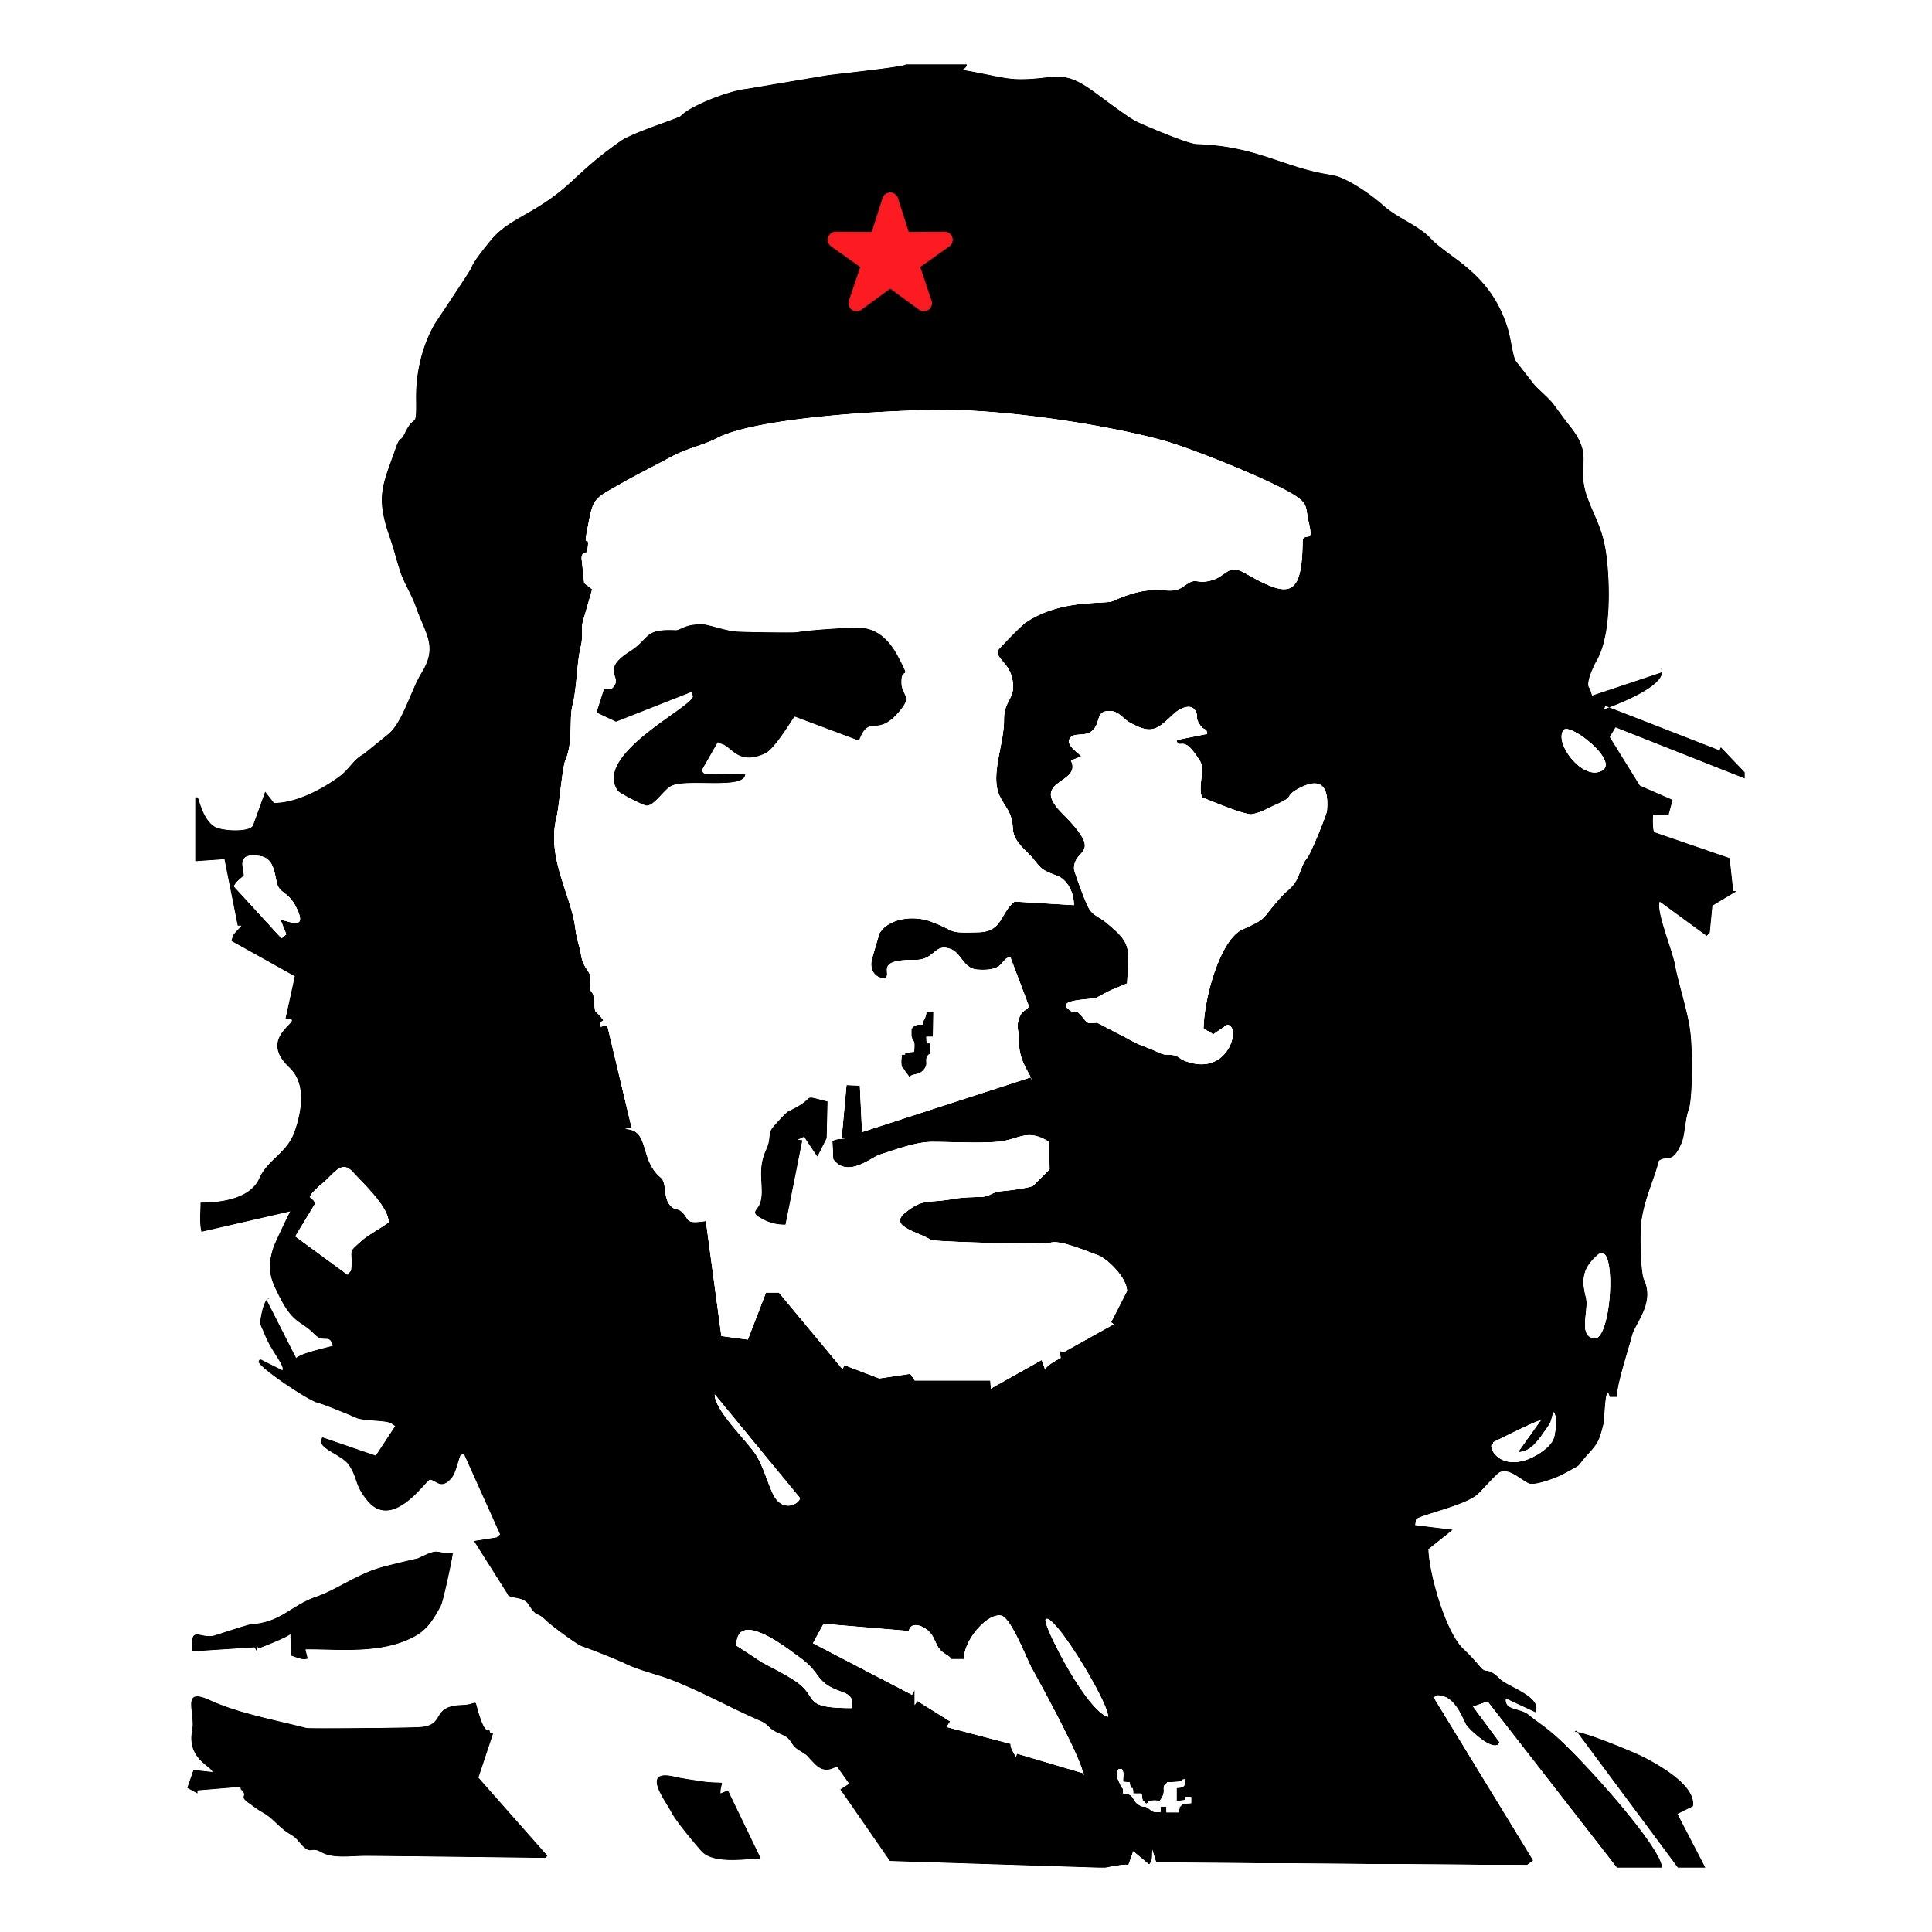 Sticker Che Guevara contour 135 x 110 mm 001